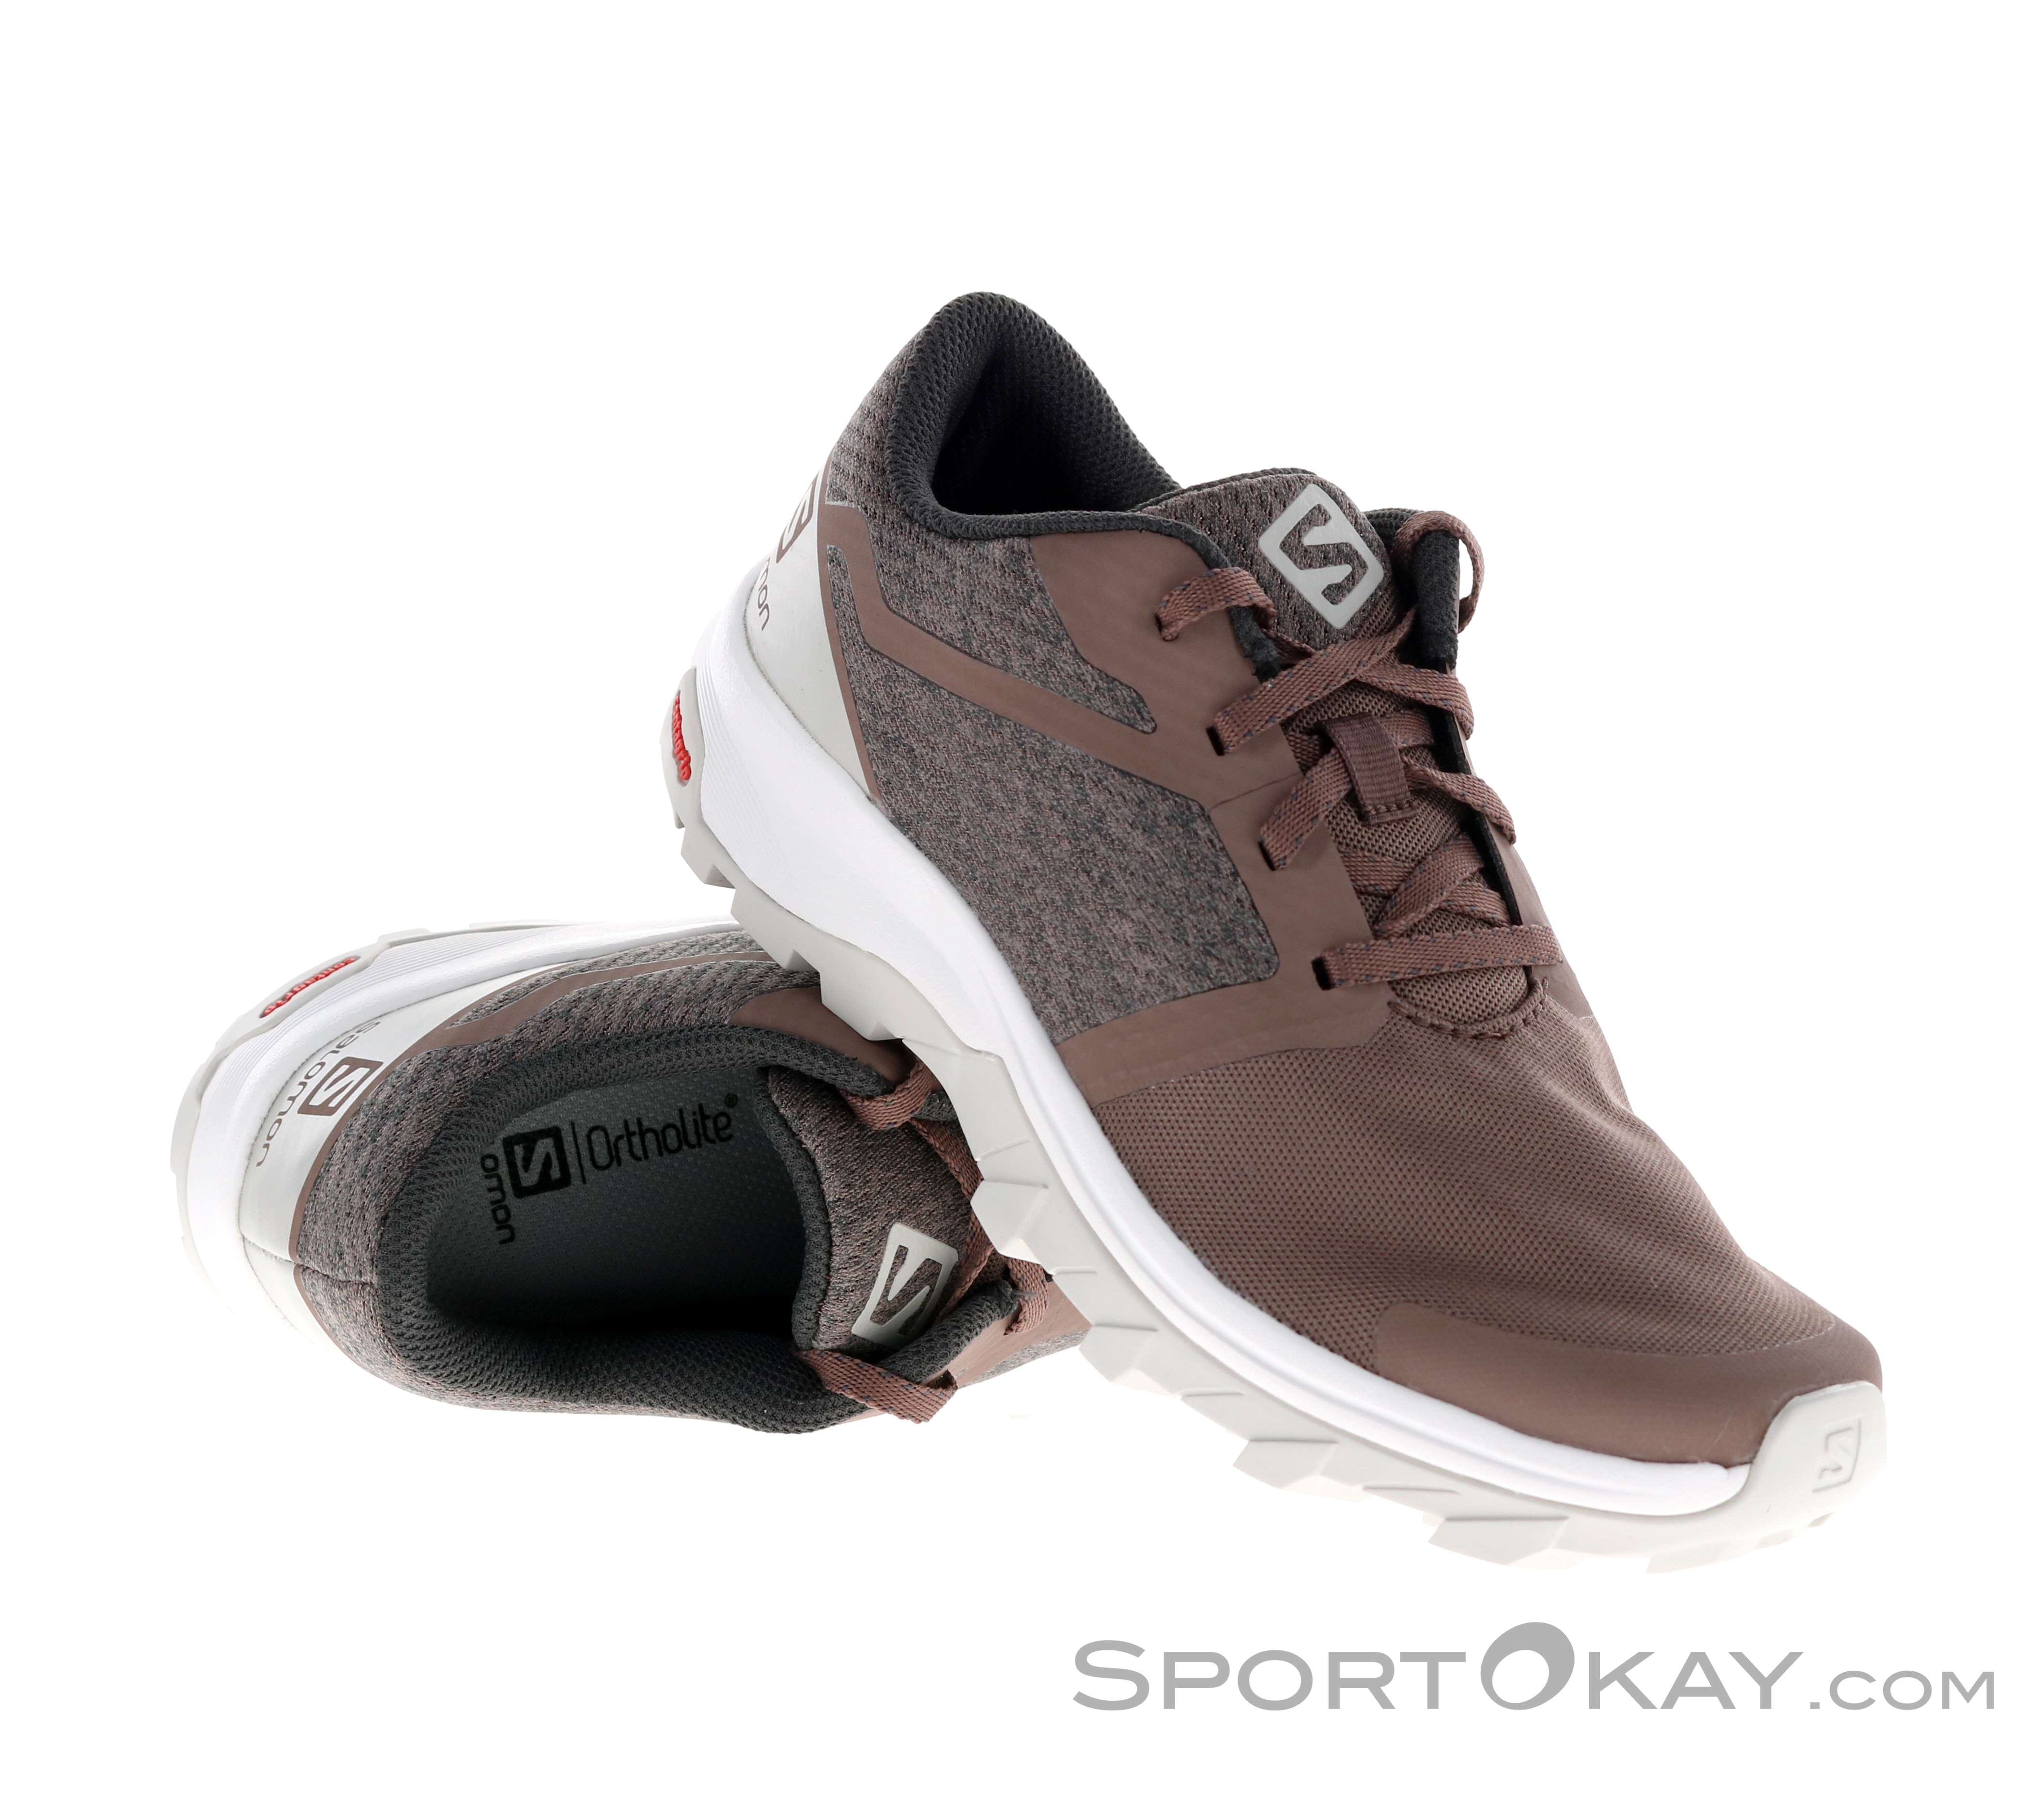 Salomon Salomon Outbound Womens Leisure Shoes